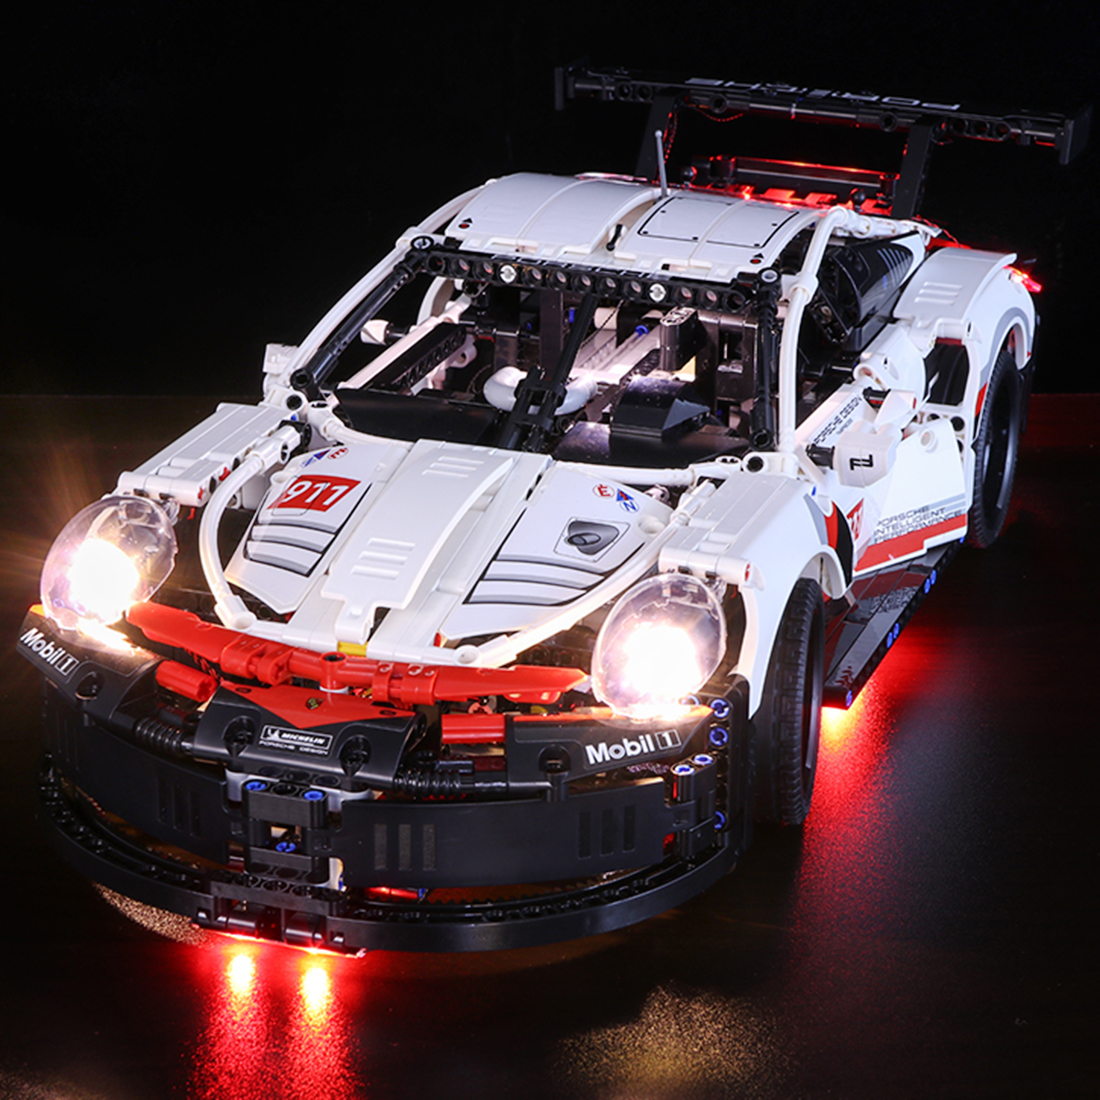 LED Light Building Block Brick Kit For Porsche 911RSR Automobile Race Car 42096 Children Birthday Gift